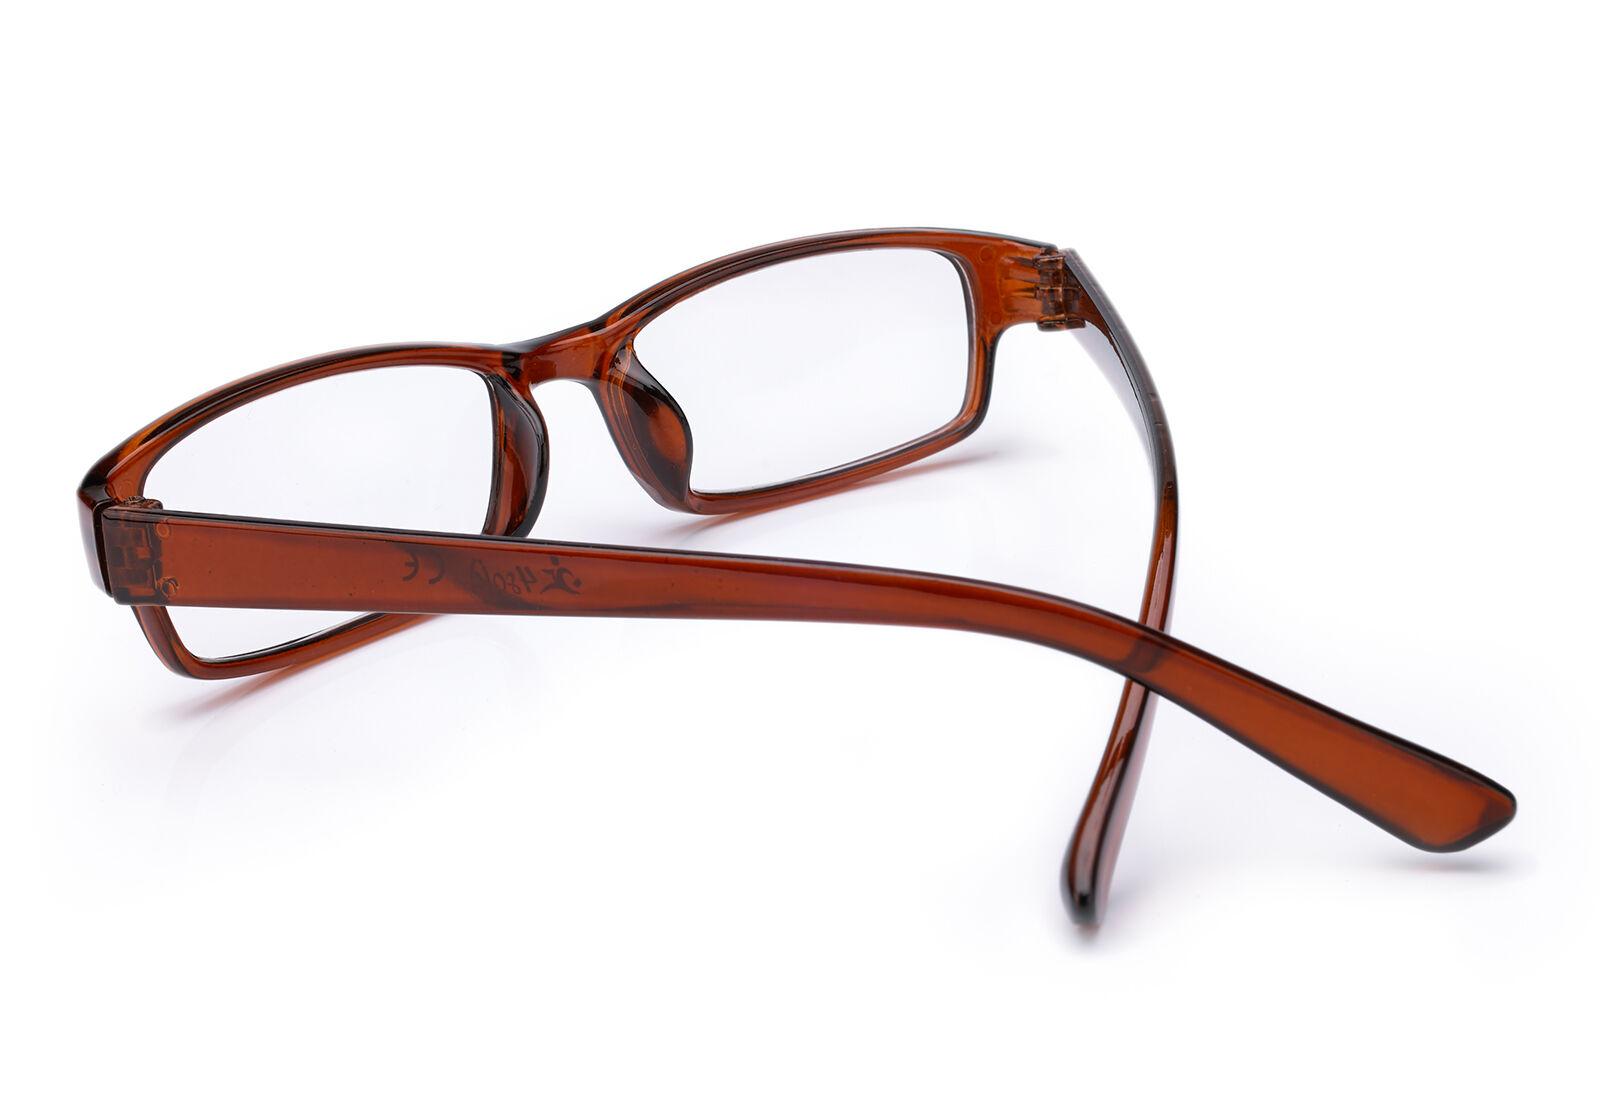 Slim Reading Glasses Form To Unisex Trendy